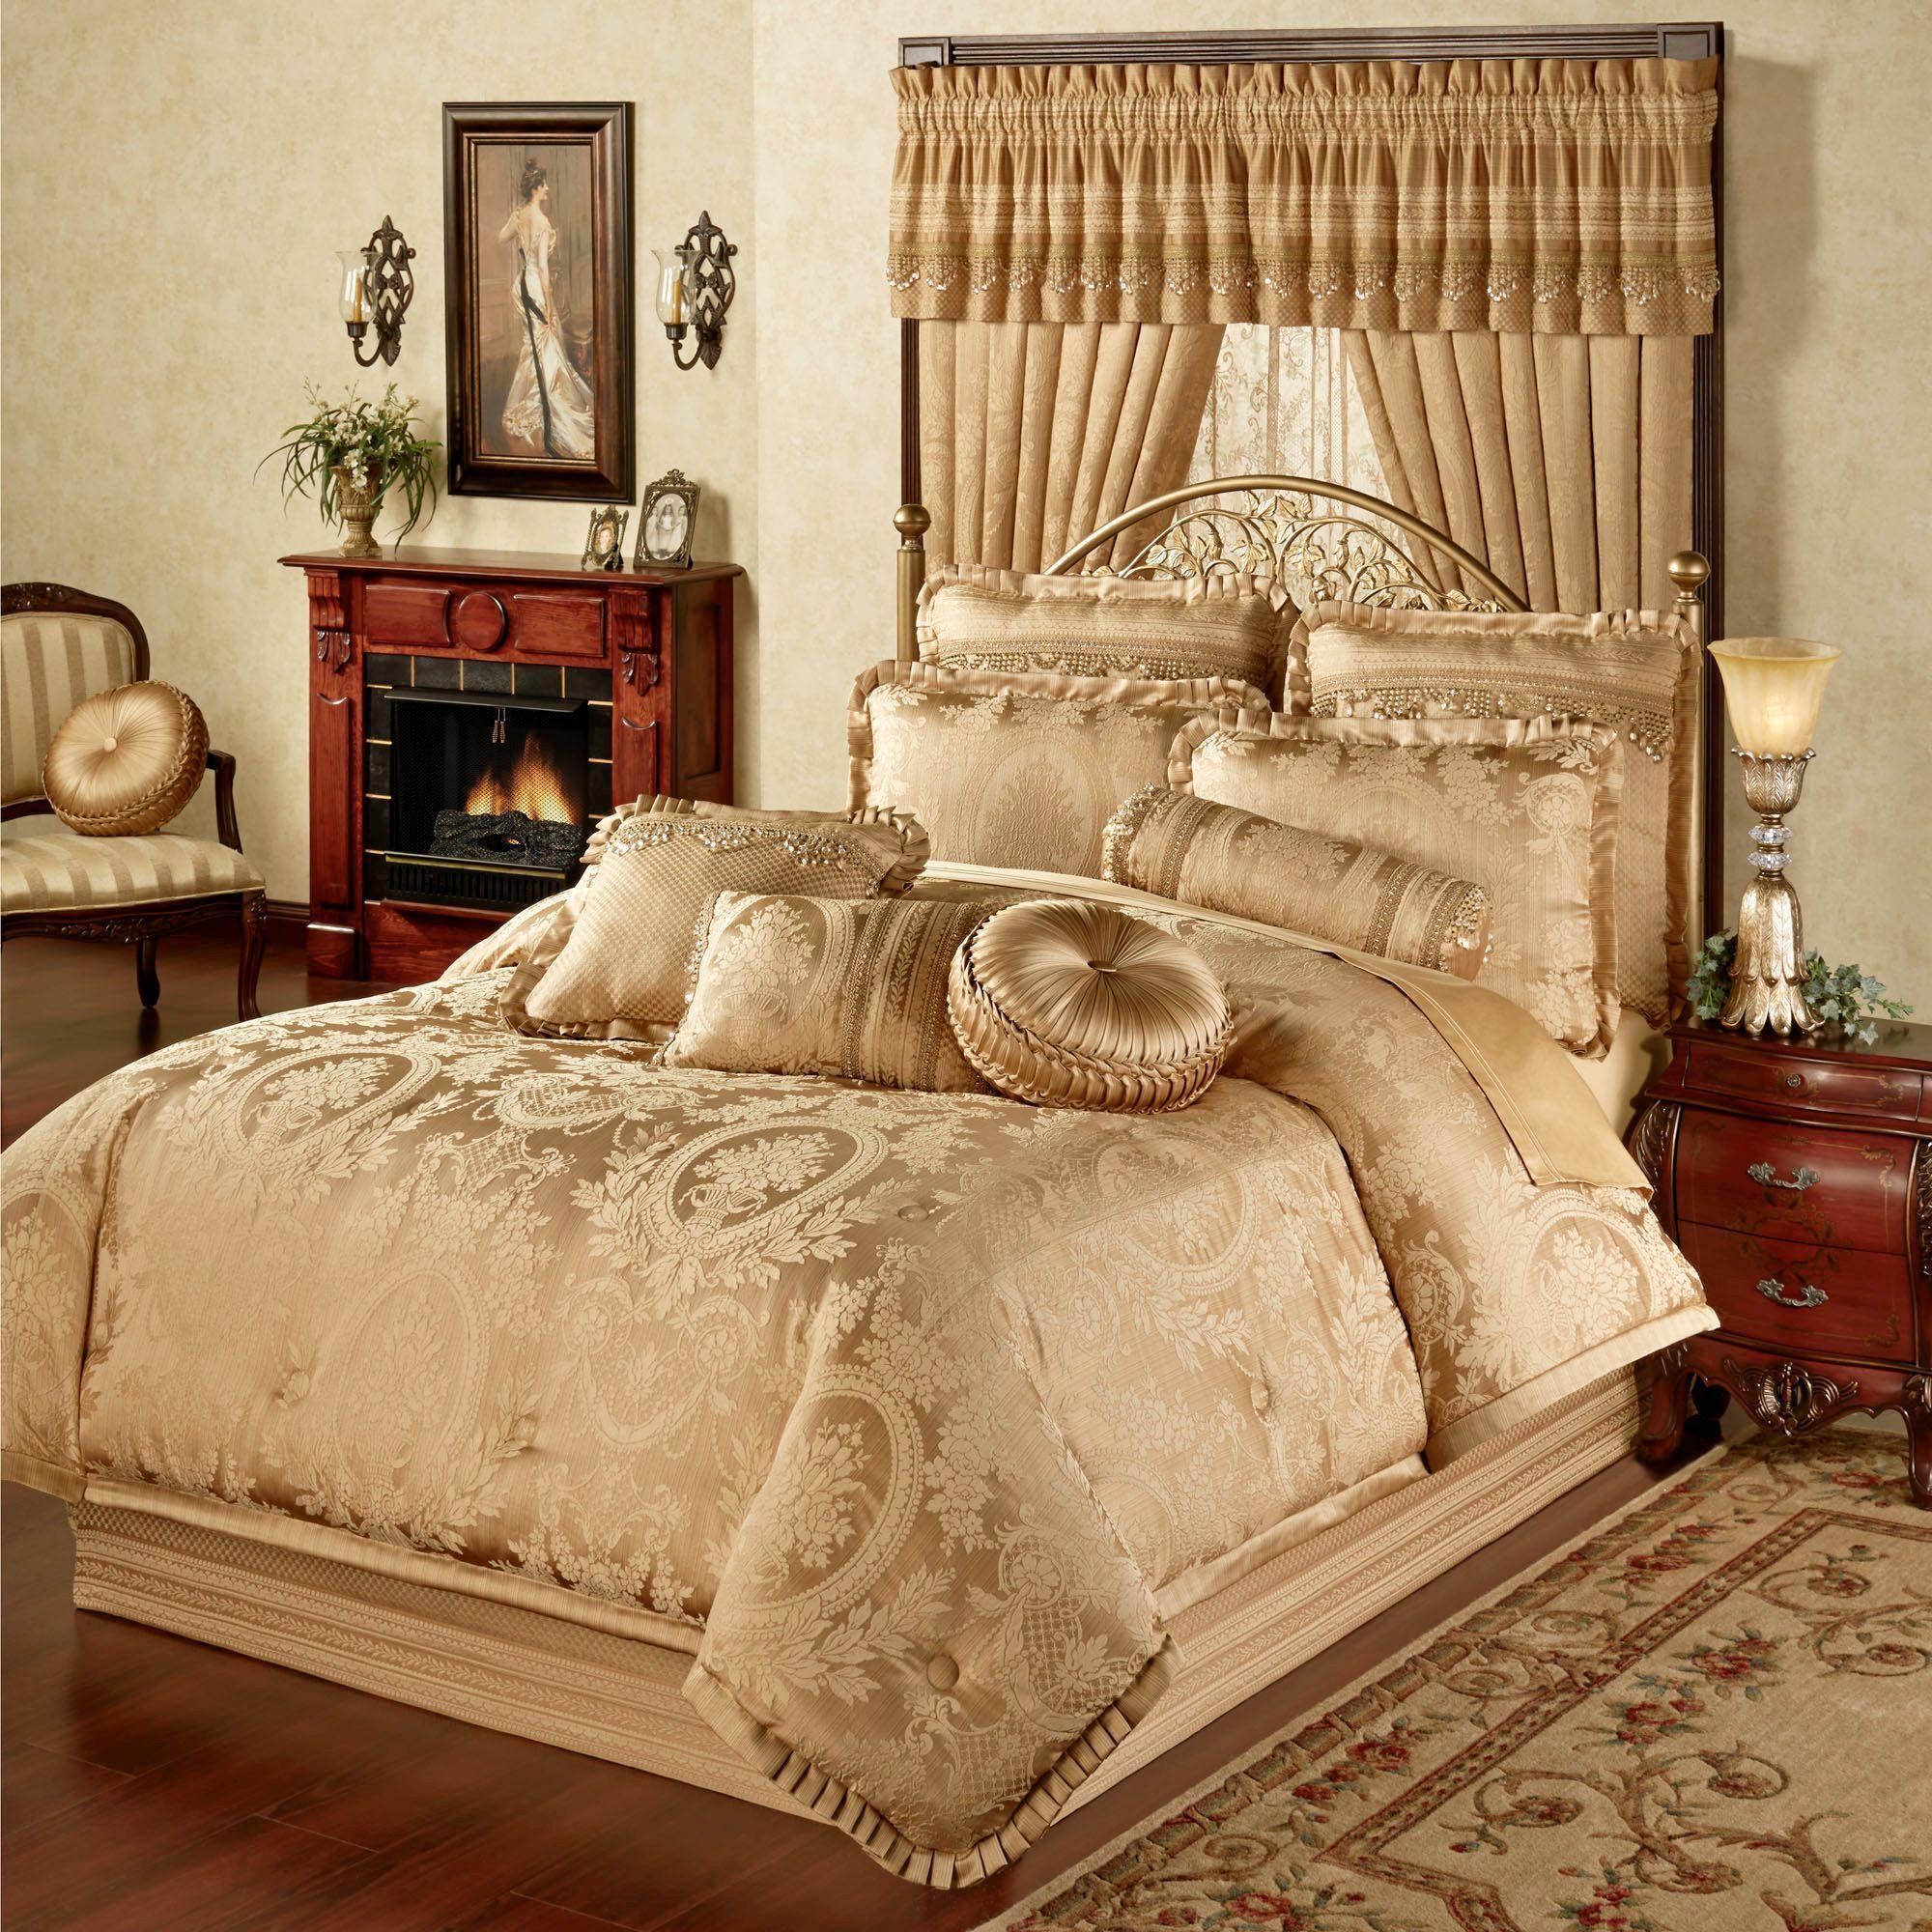 Corsica Gold Comforter Bedding in 2020 Luxury bedding